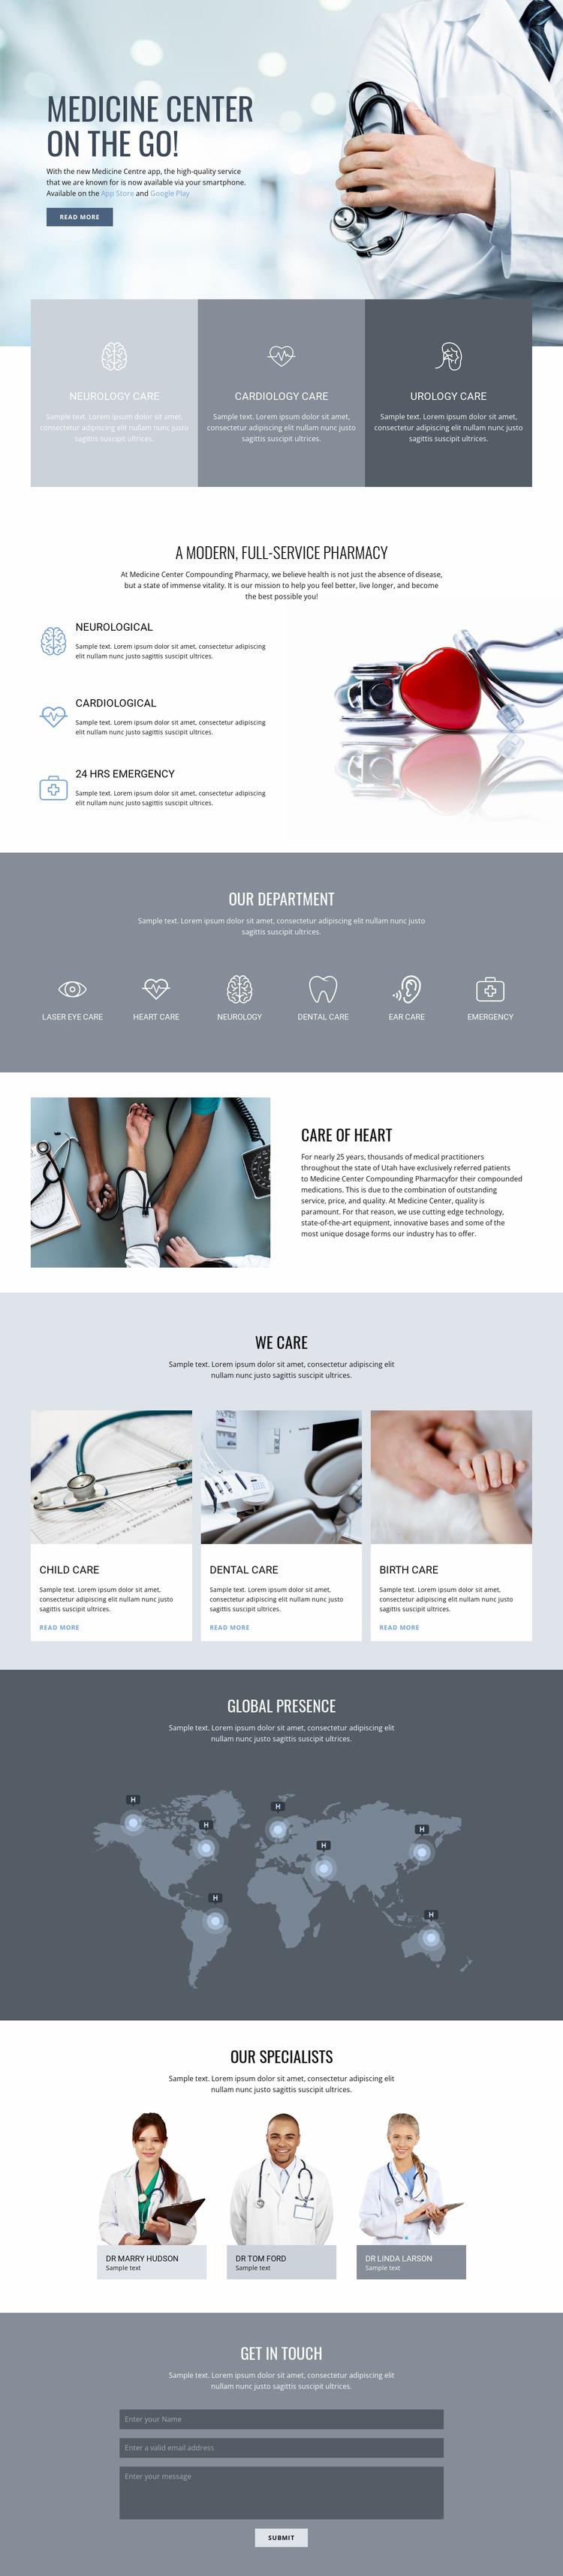 Center of quality medicine Html Website Builder